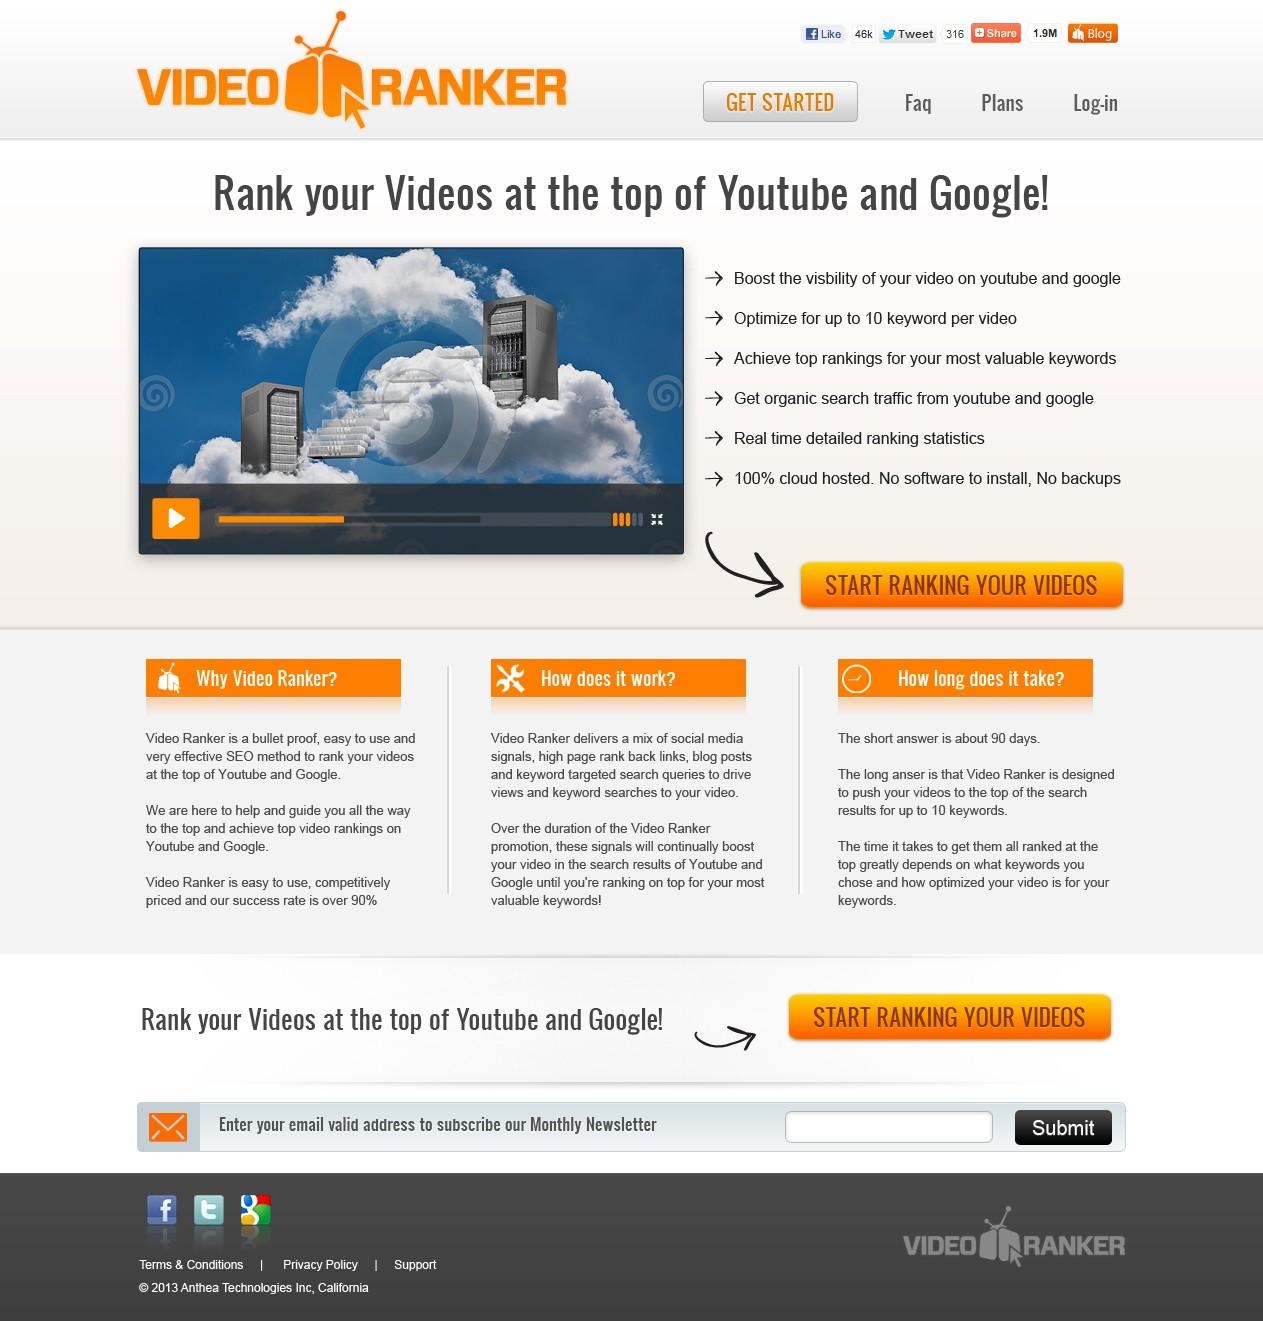 Create the next website design for VideoRanker